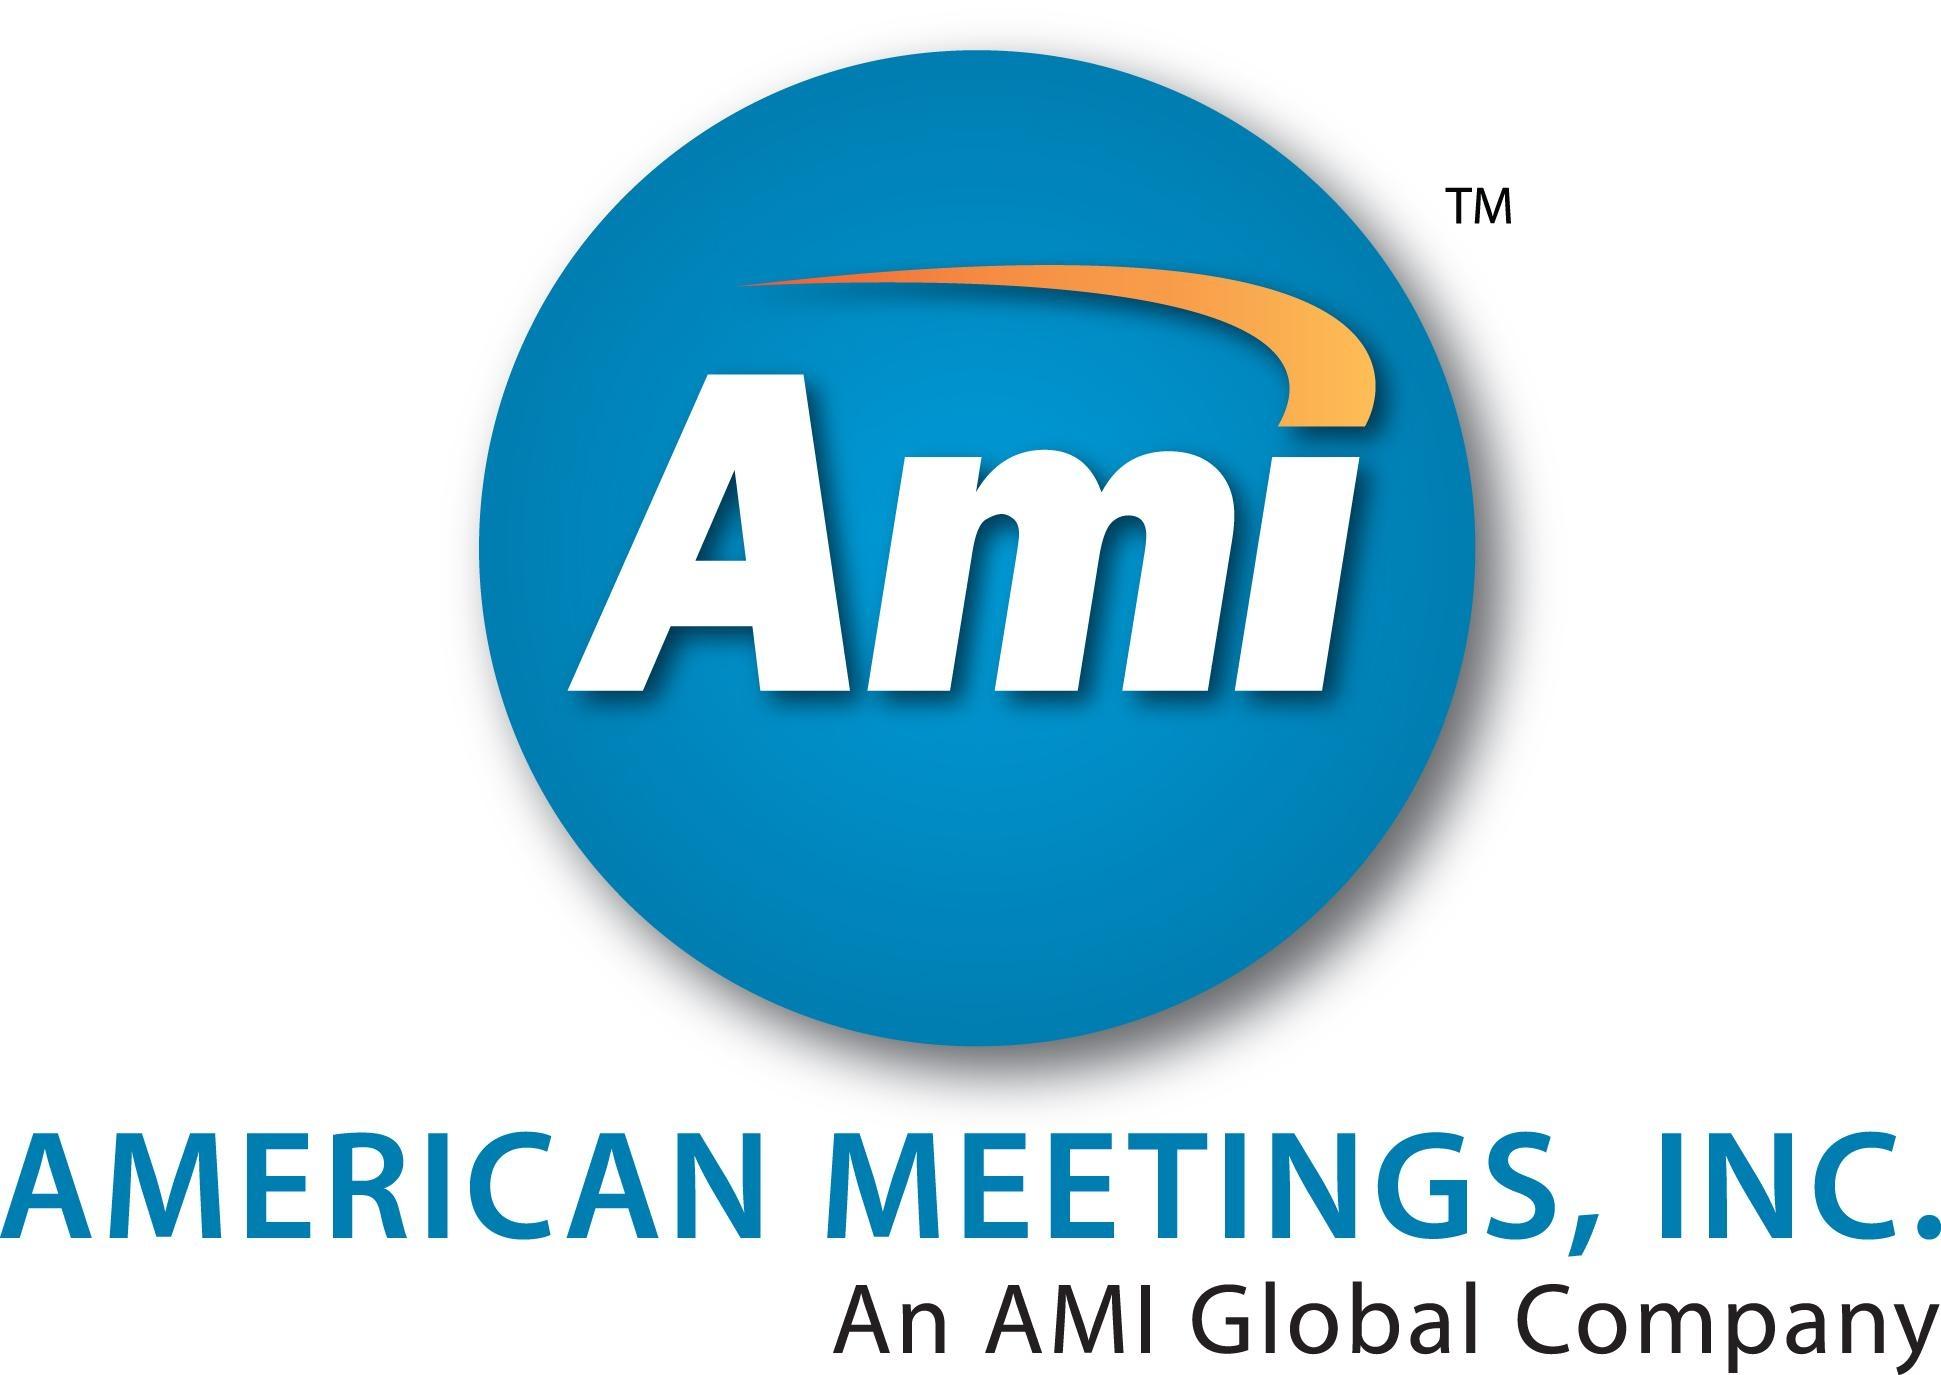 AMERICAN MEETINGS INC - AMI